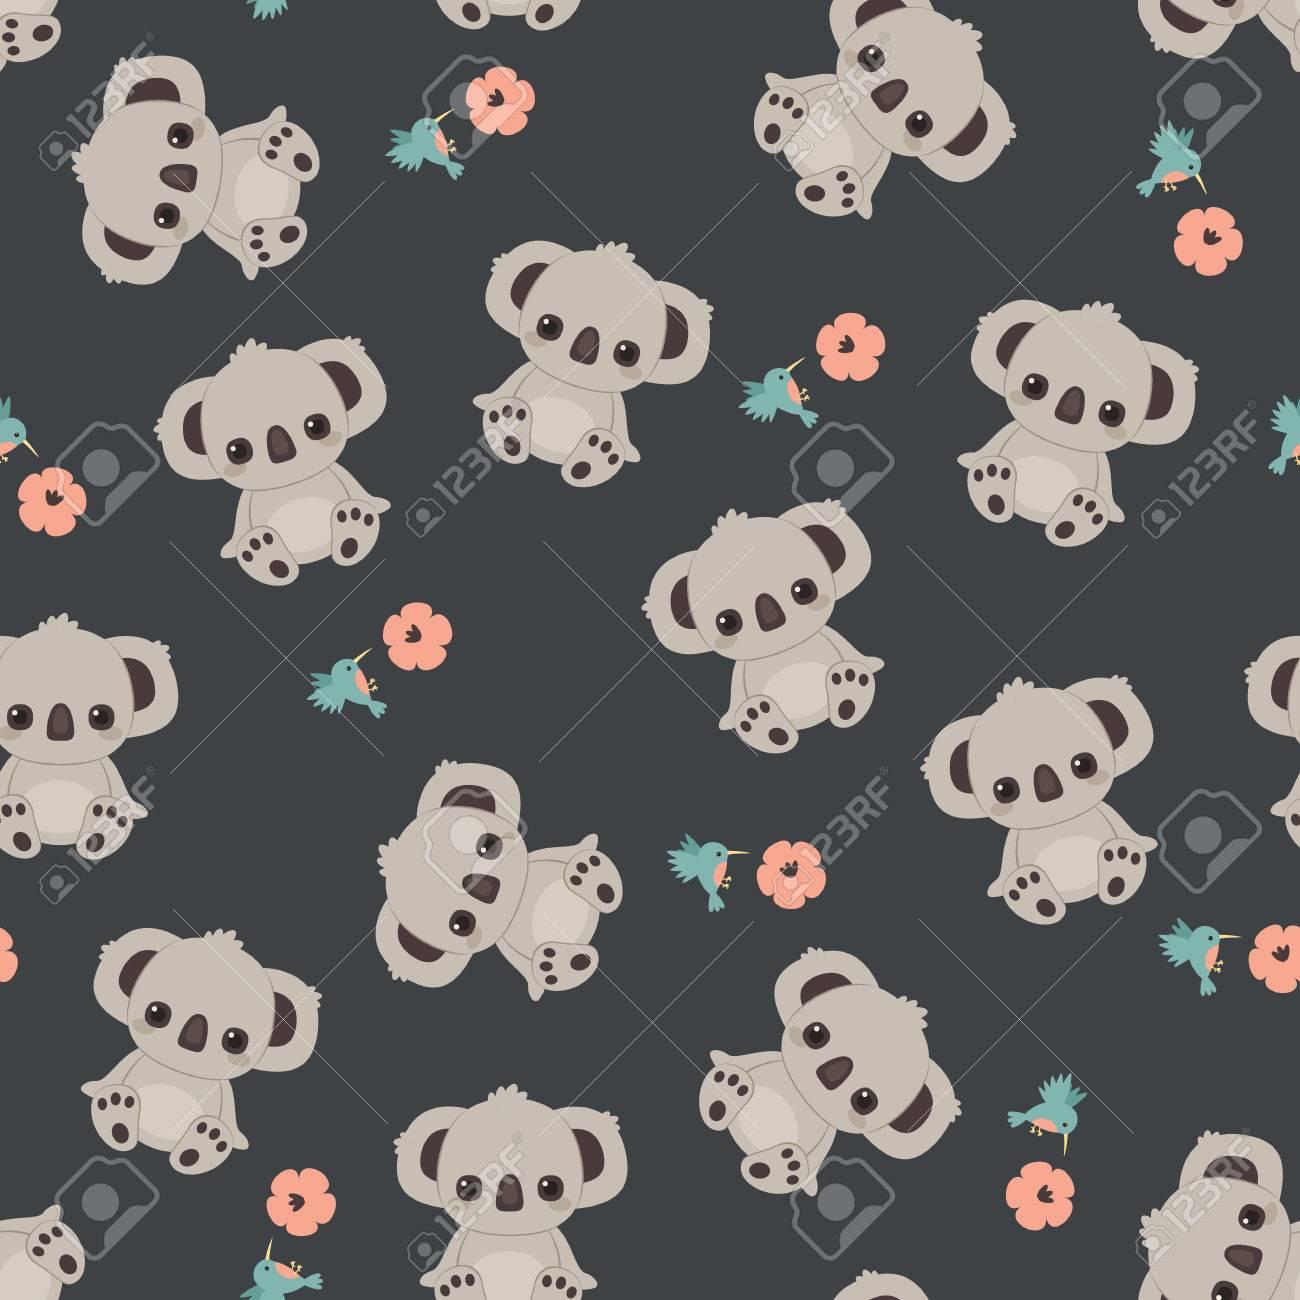 Download Wallpaper Koala Cartoon - 84360454-cute-cartoon-koala-floral-seamless-pattern-wallpaper  Photograph_76818   .jpg